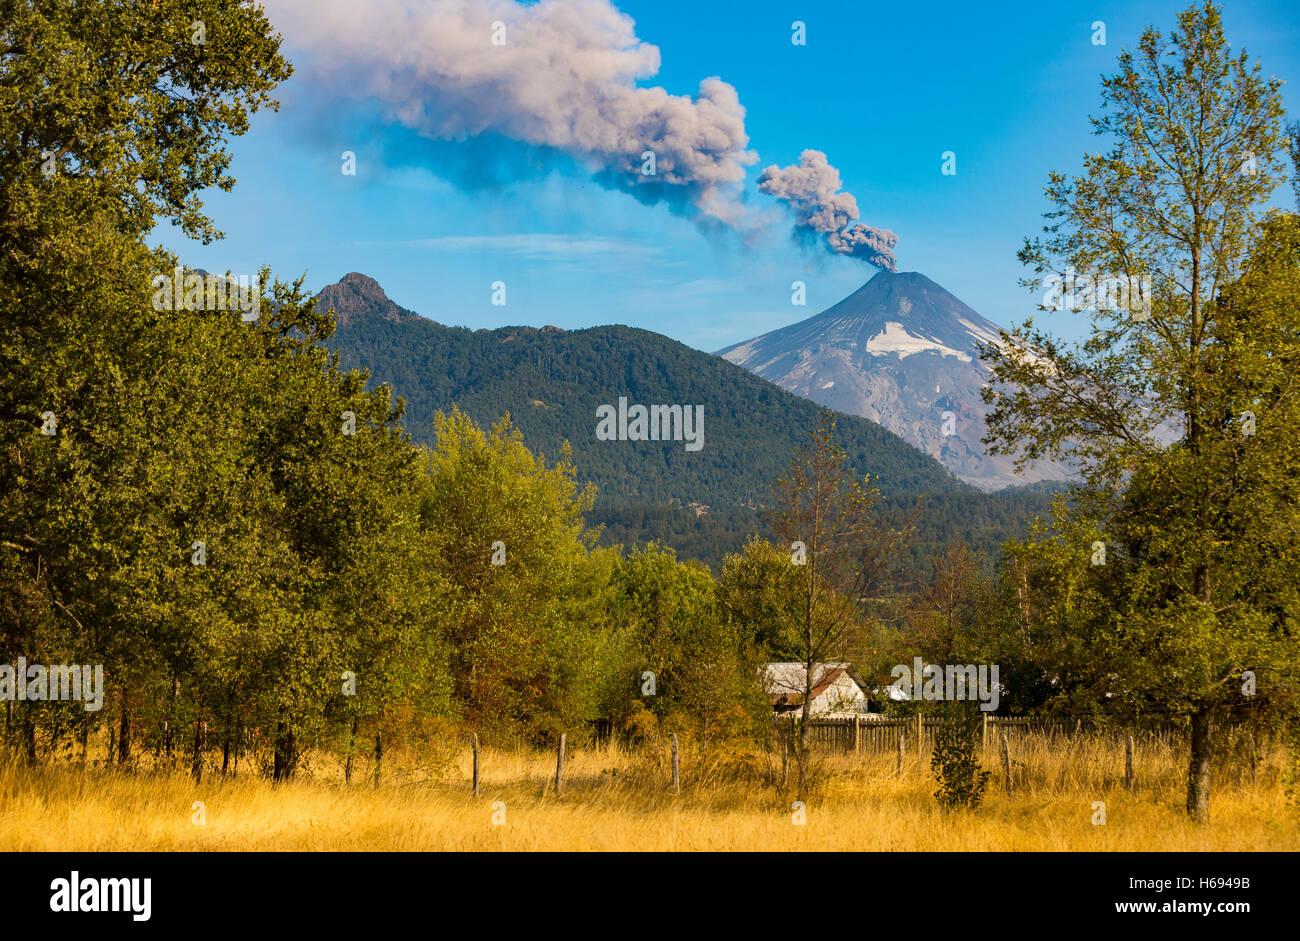 Villarrica volcano in the Araucania Distrit, Patagonia, Chile. Volcan Villarrica, Araucania. Mapuches land. - Stock Image